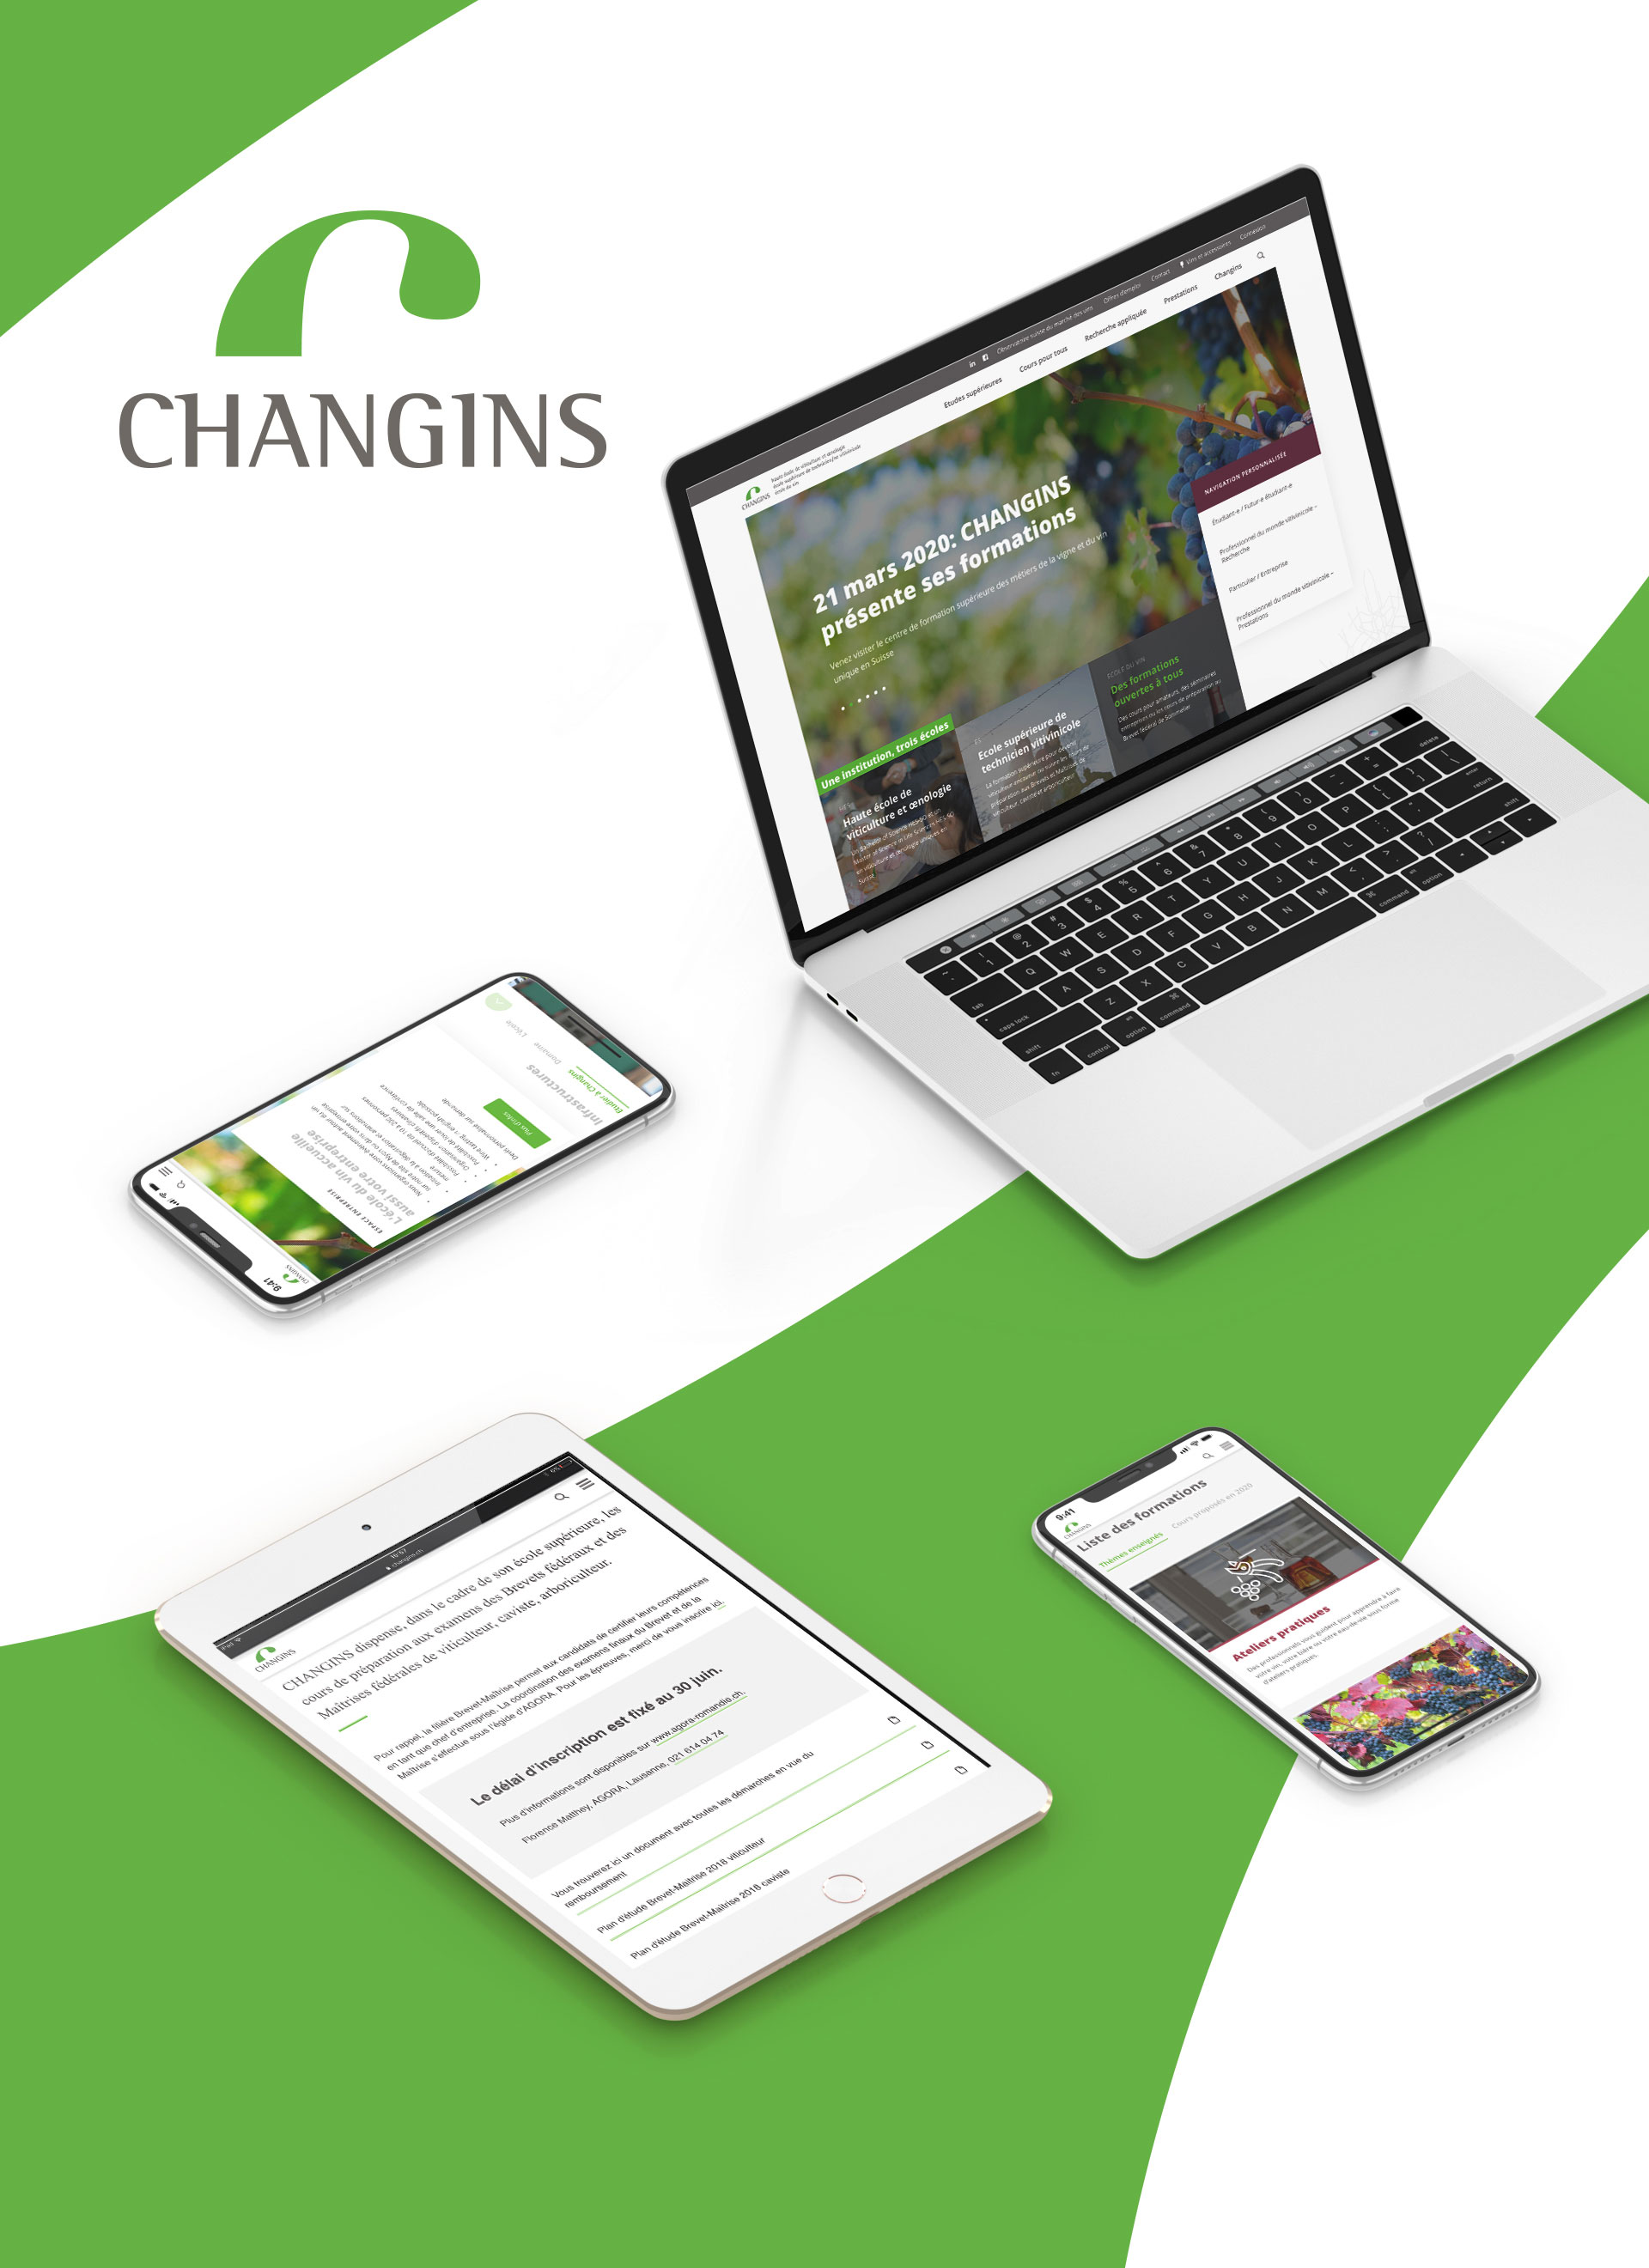 CHANGINS - WNG Agence Digitale